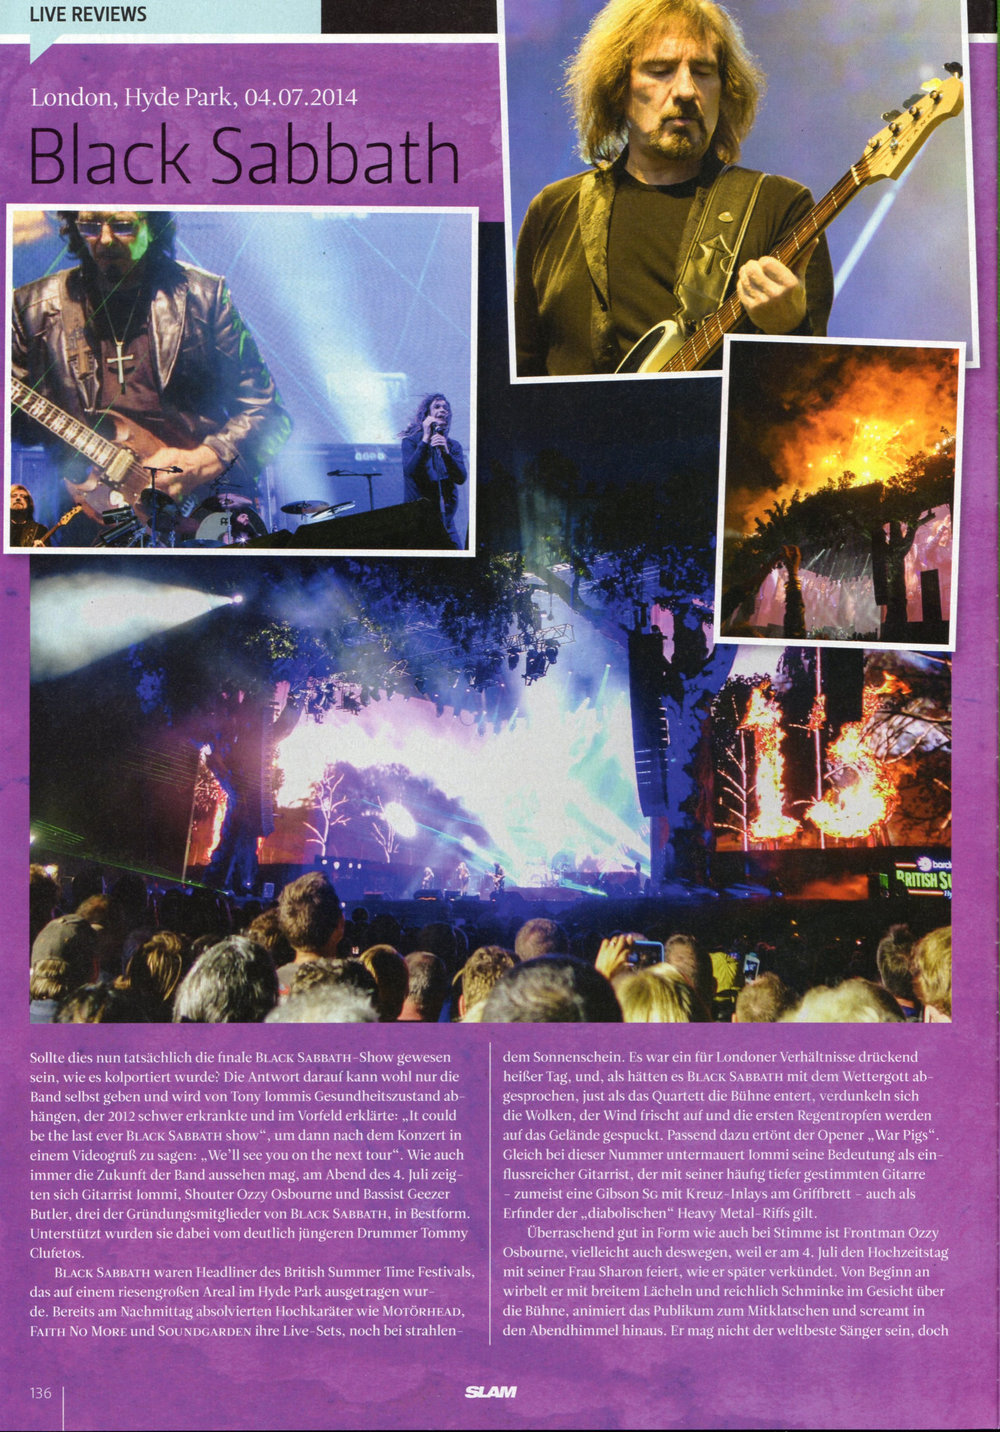 BLACK SABBATH live in London/Hyde Park, 2014 (1)